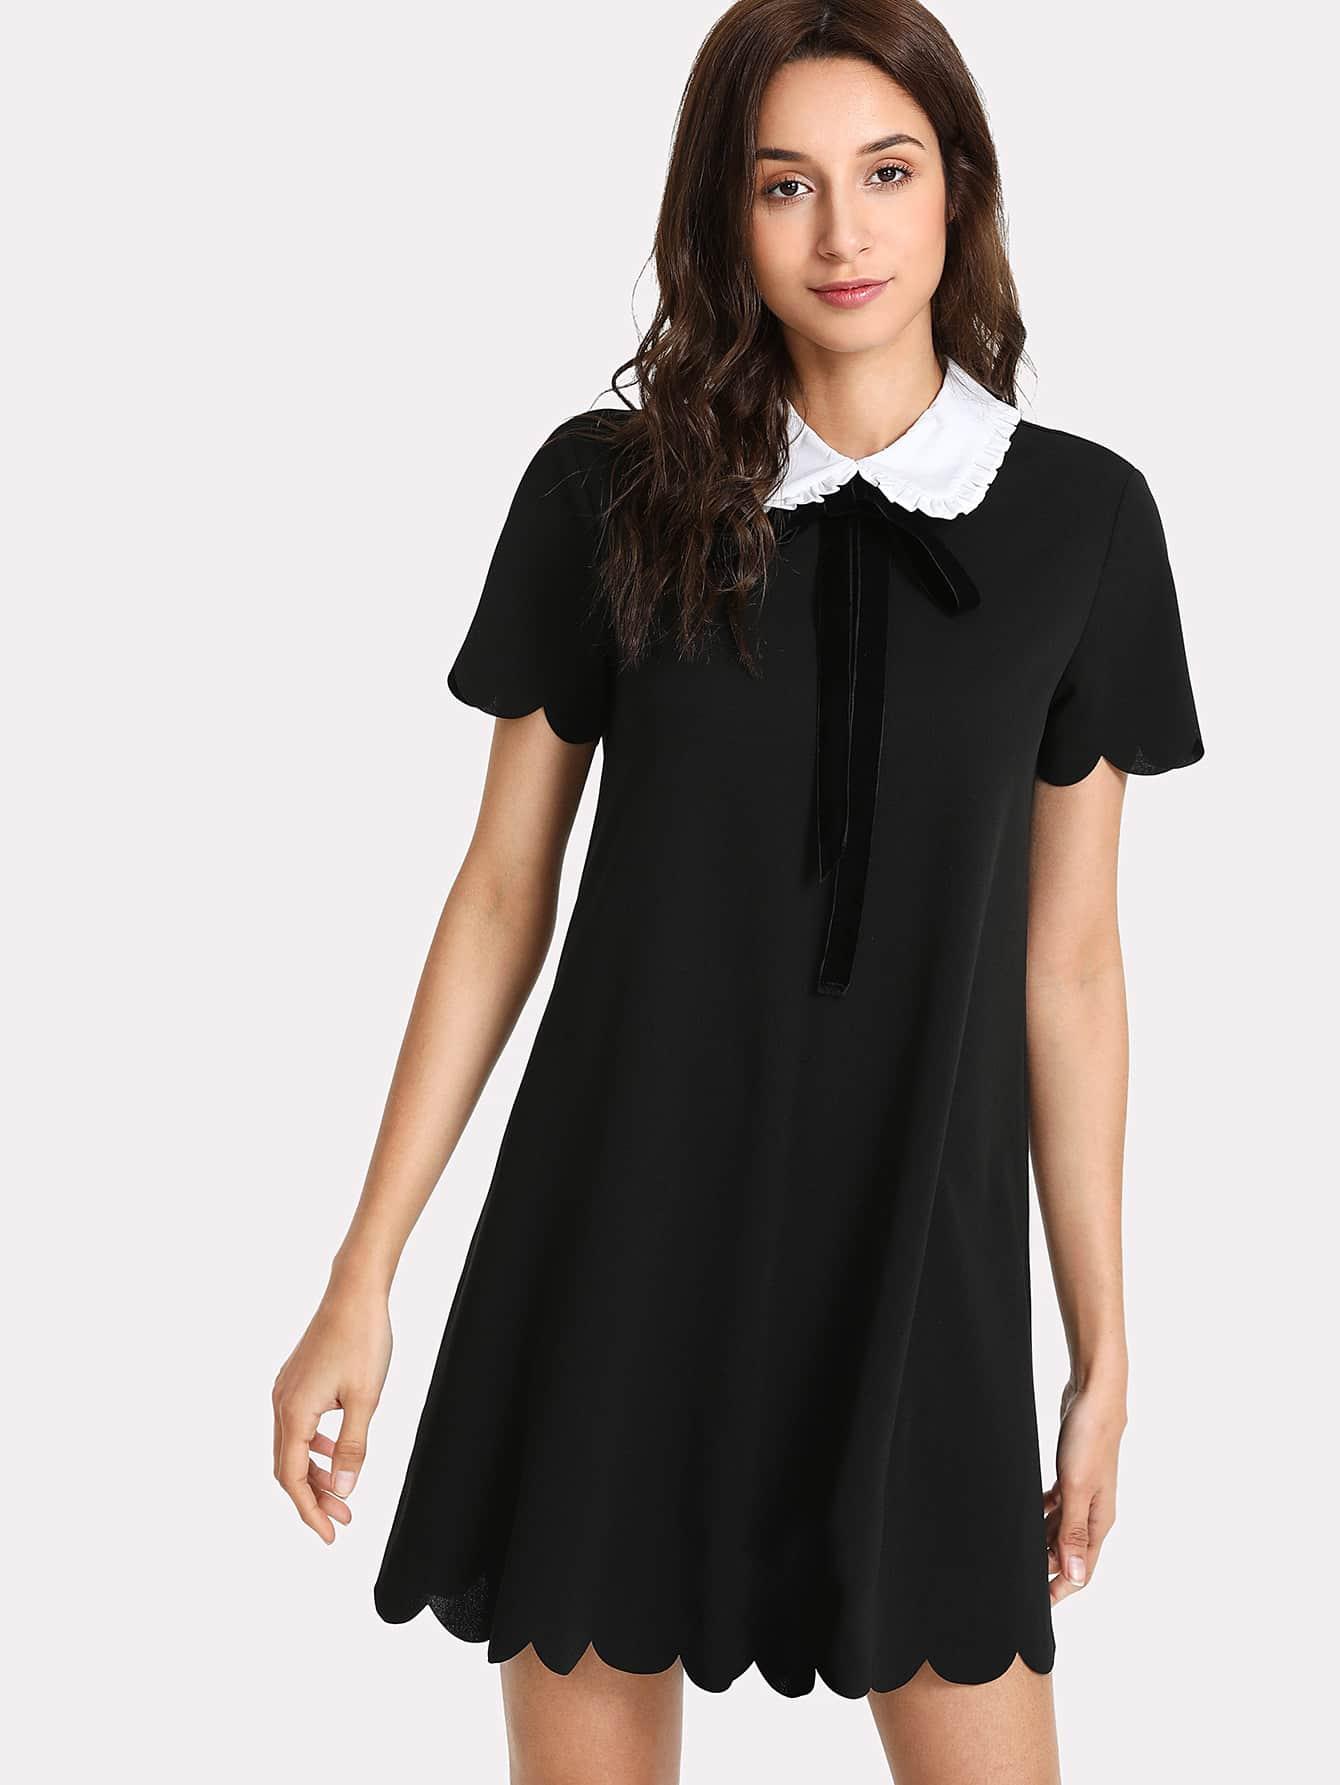 Contrast Collar Scallop Trim Dress contrast scallop trim balloon sleeve shirt